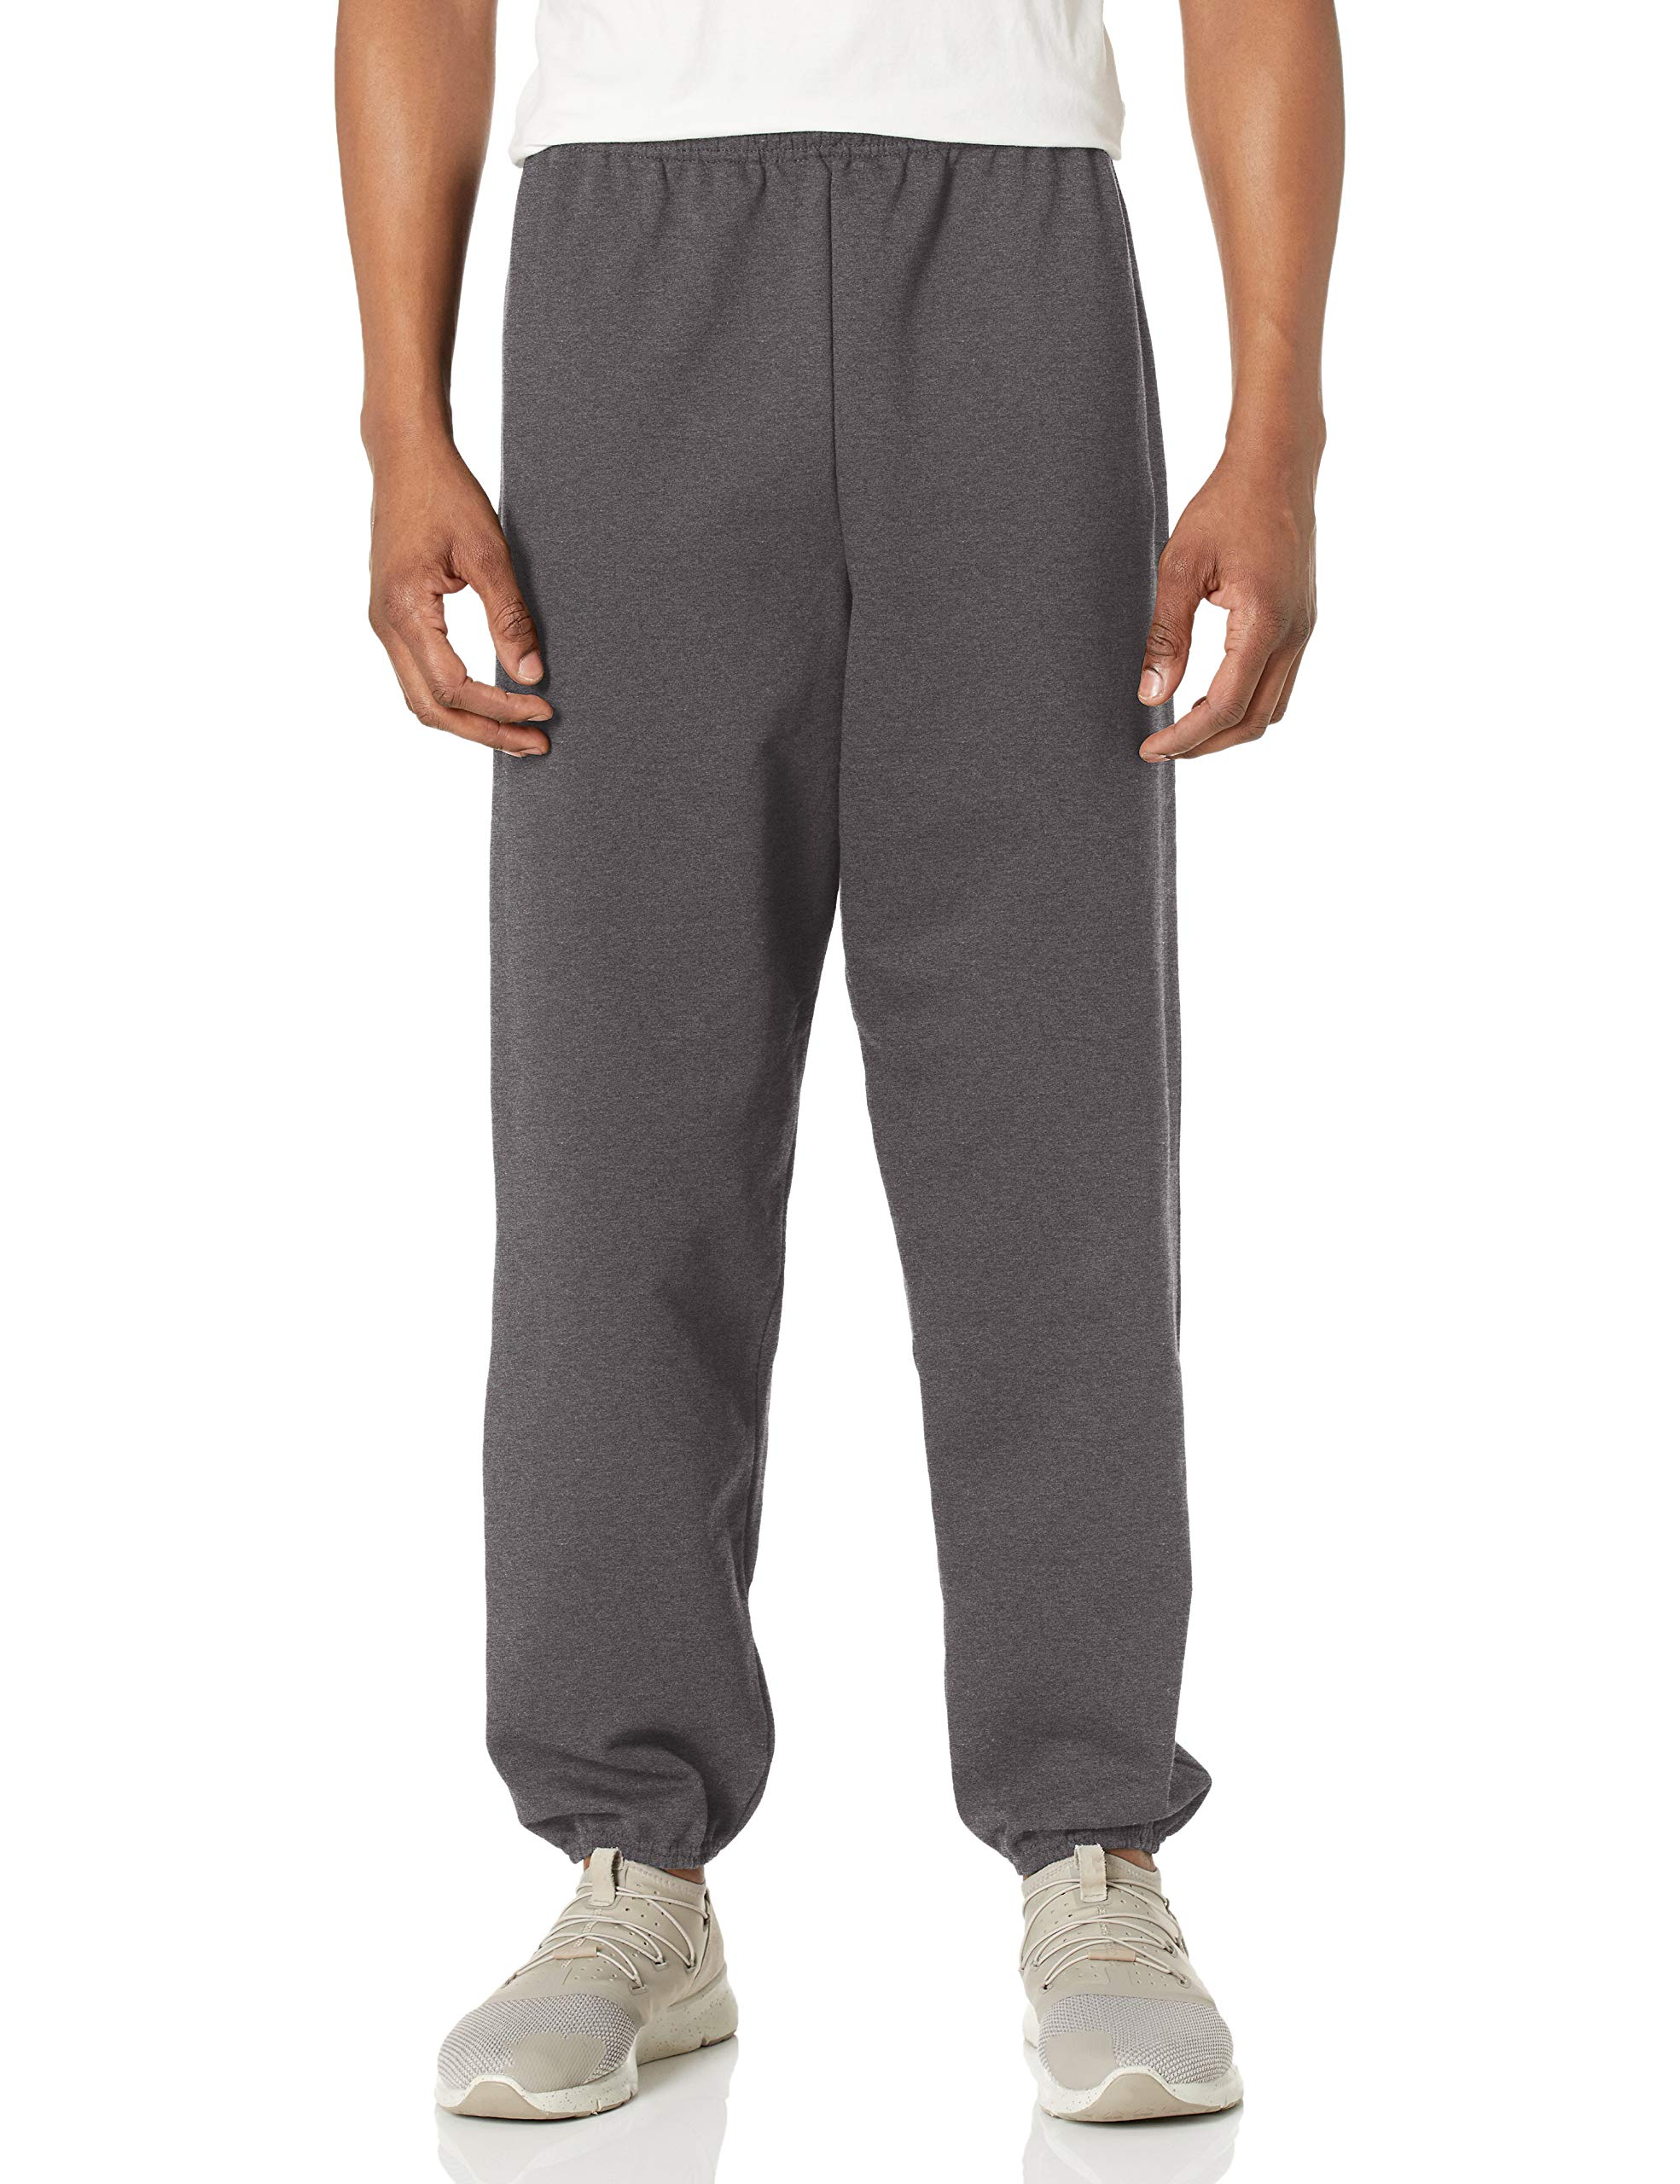 Men's EcoSmart Fleece Non-Pocket Sweatpant